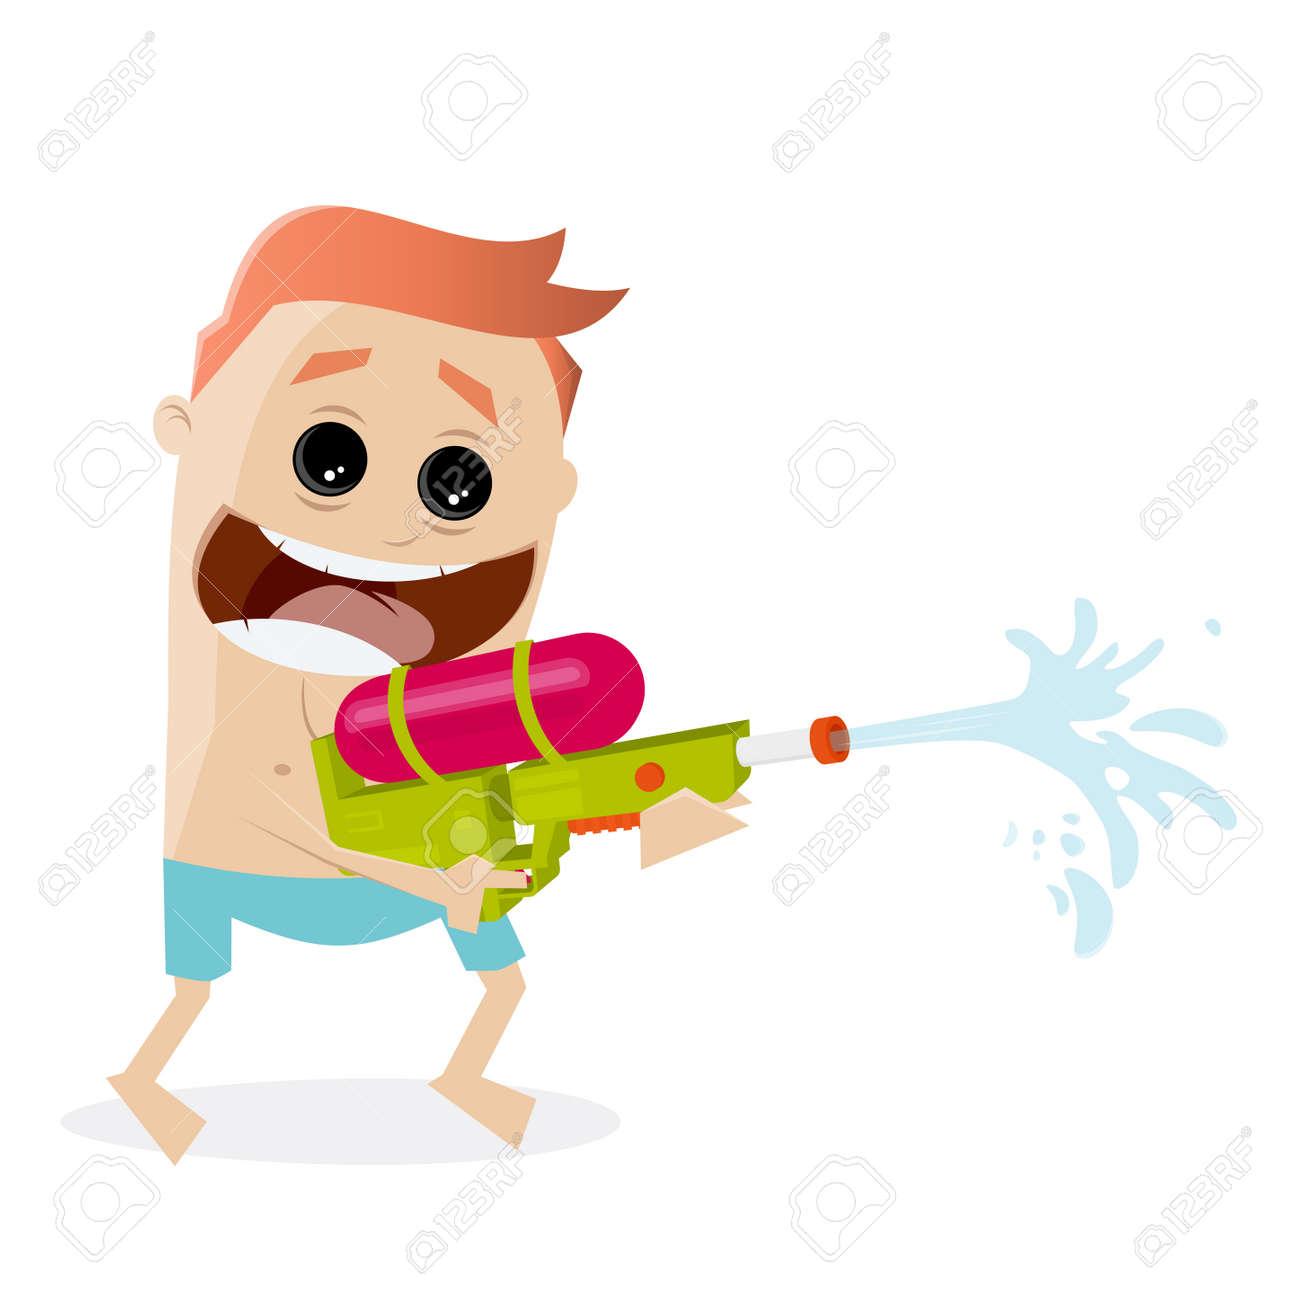 funny cartoon man shooting with a water gun Standard-Bild - 85098118